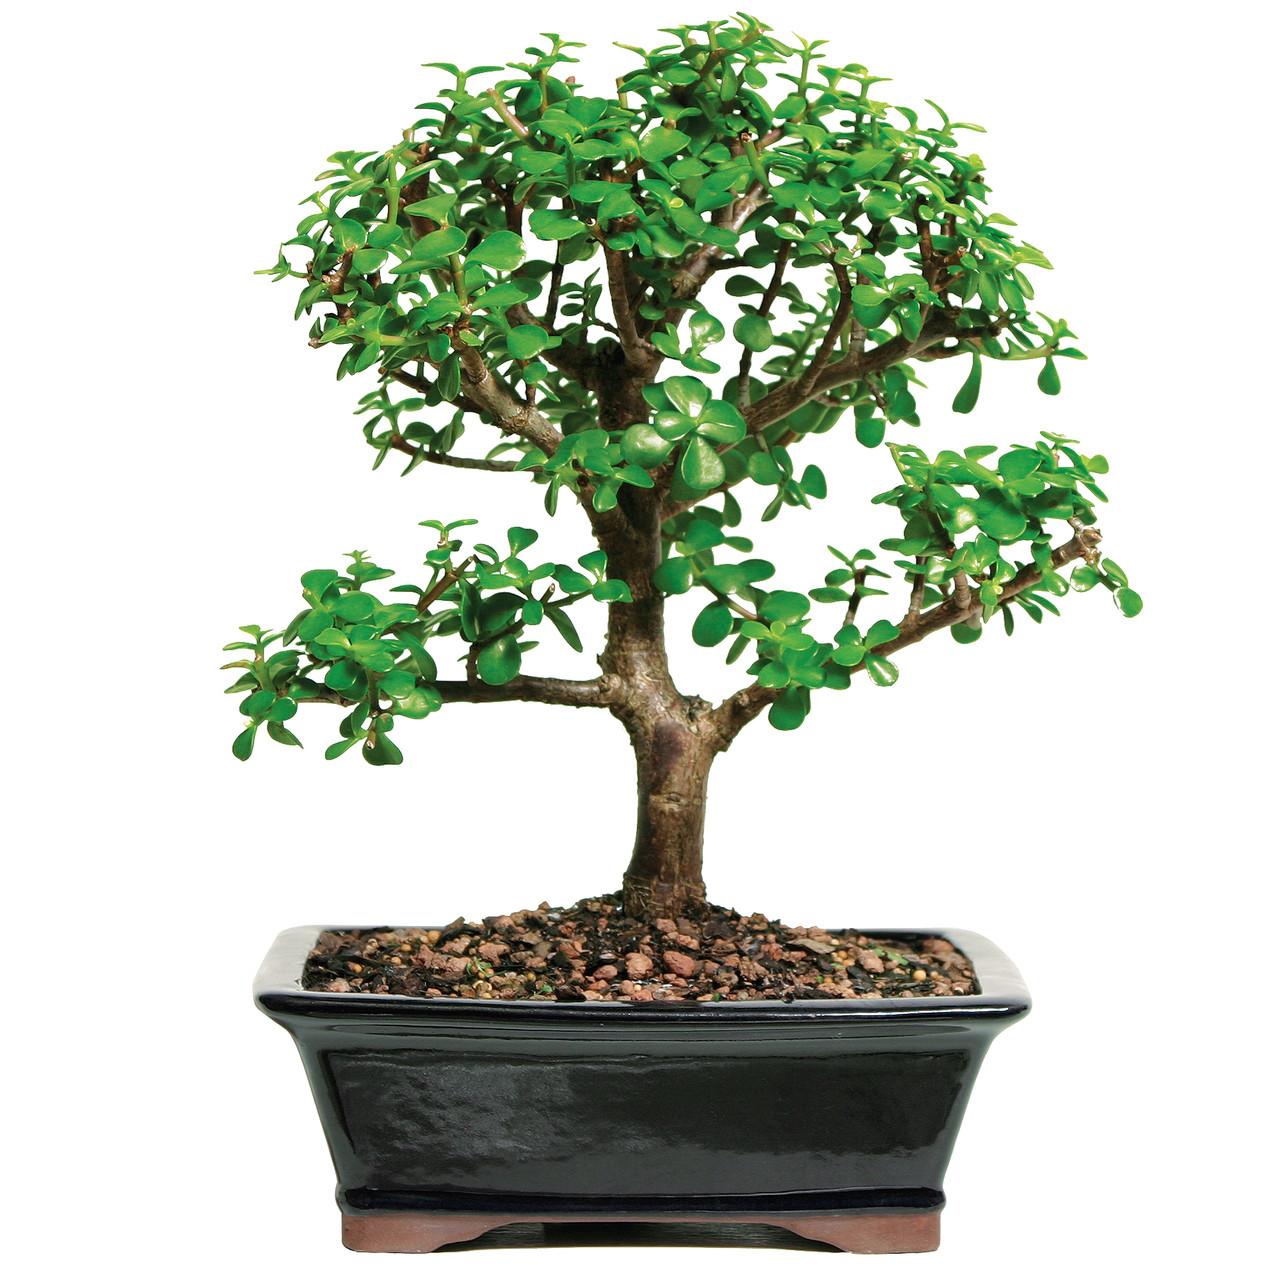 Tremendous Best Selling Mini Jade Bonsai Ideal For Indoor And Beginners Wiring 101 Photwellnesstrialsorg